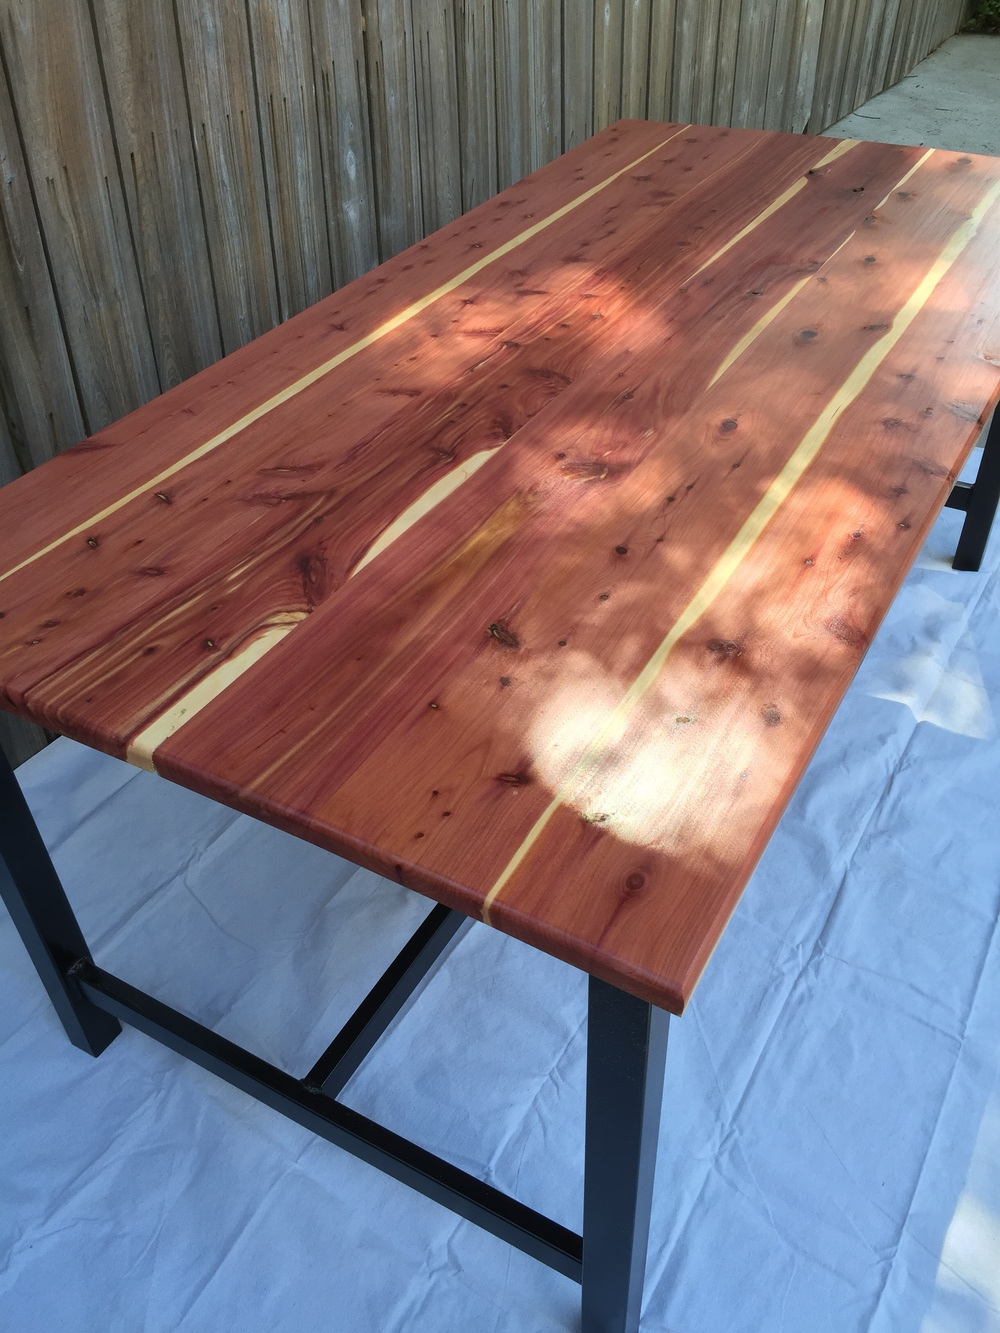 carpentry/furniture — impressive creations